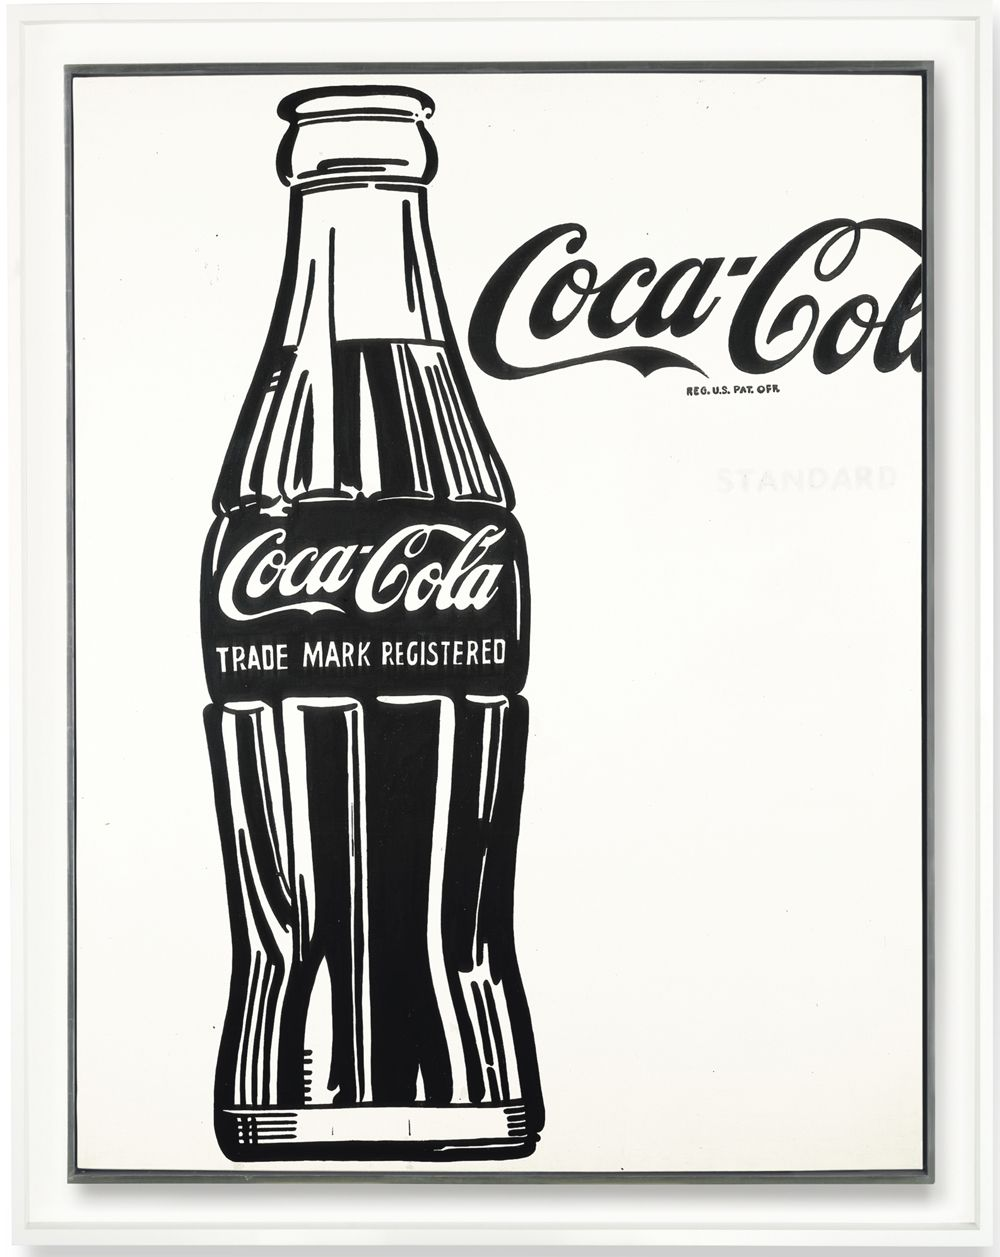 Top 7 andy warhol coca cola | Andy Warhol - Top 10 paintings | Pinterest